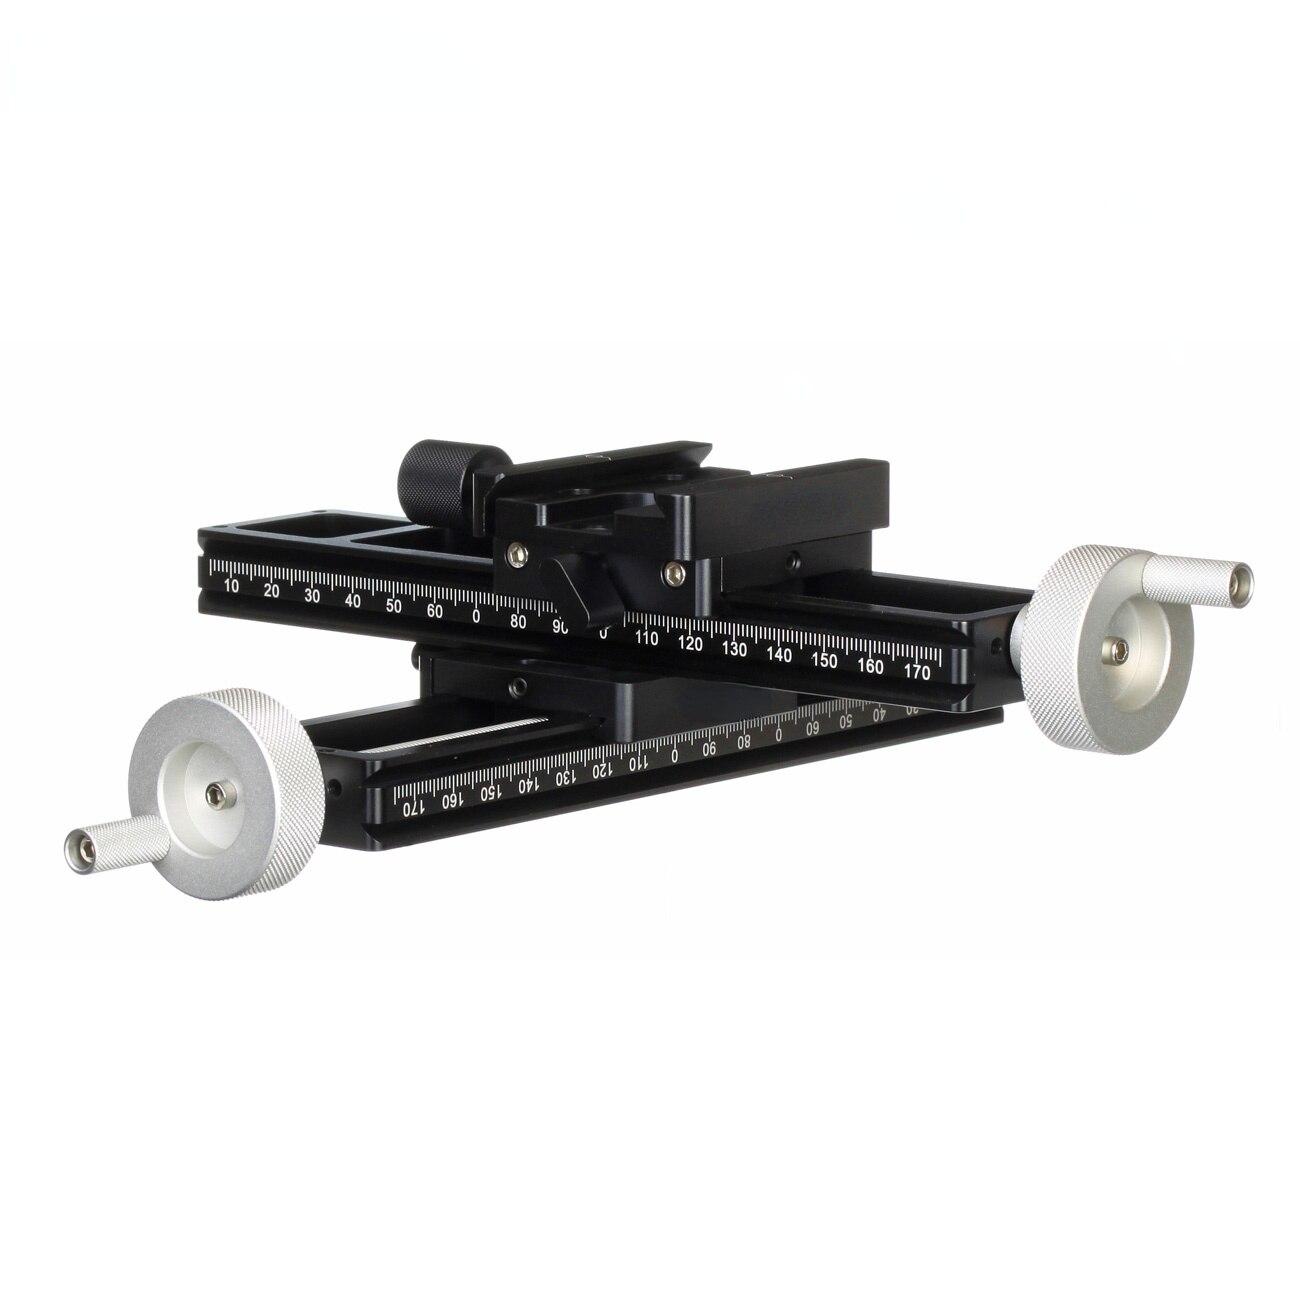 Two-Way White Bar Fine Macro-Fousing Head Camera Accessories Handwheel Rocker Macro Stacking Shooting Precision Focus